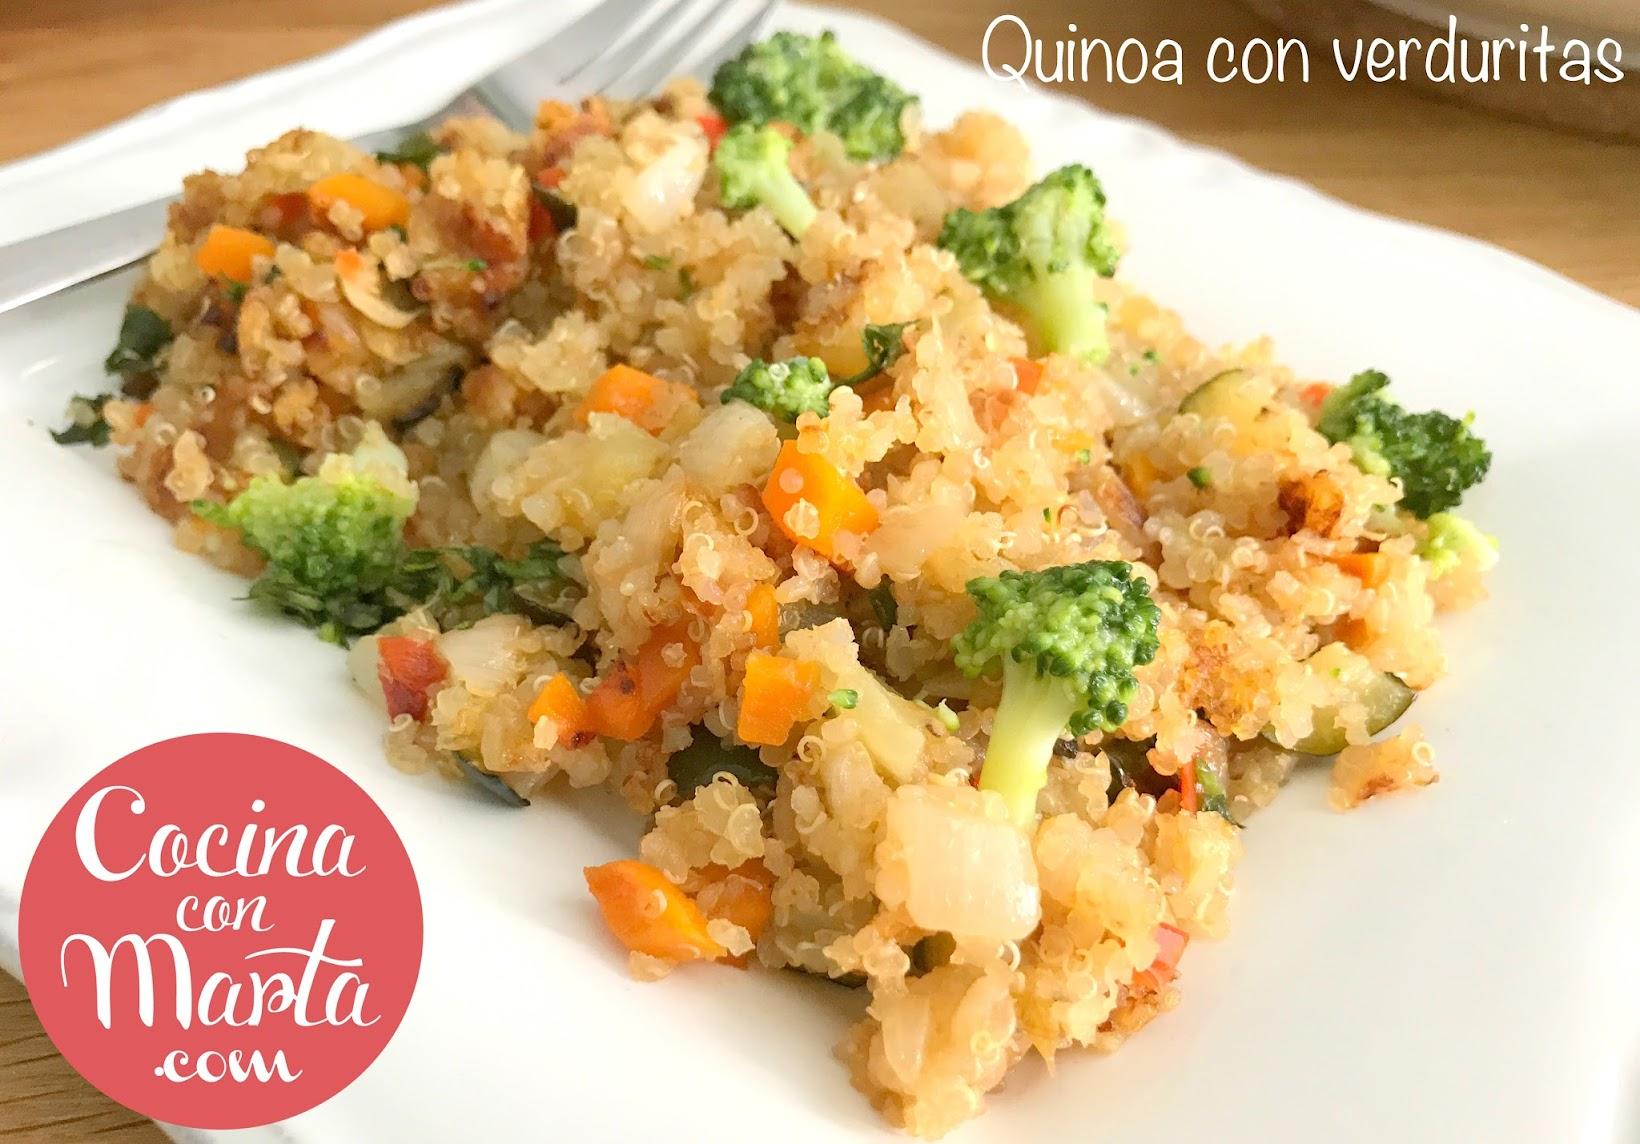 quinoa salteada con verduras, recetas con quinoa, recetas sanas, dieta, receta rápida, fácil, cocina con marta